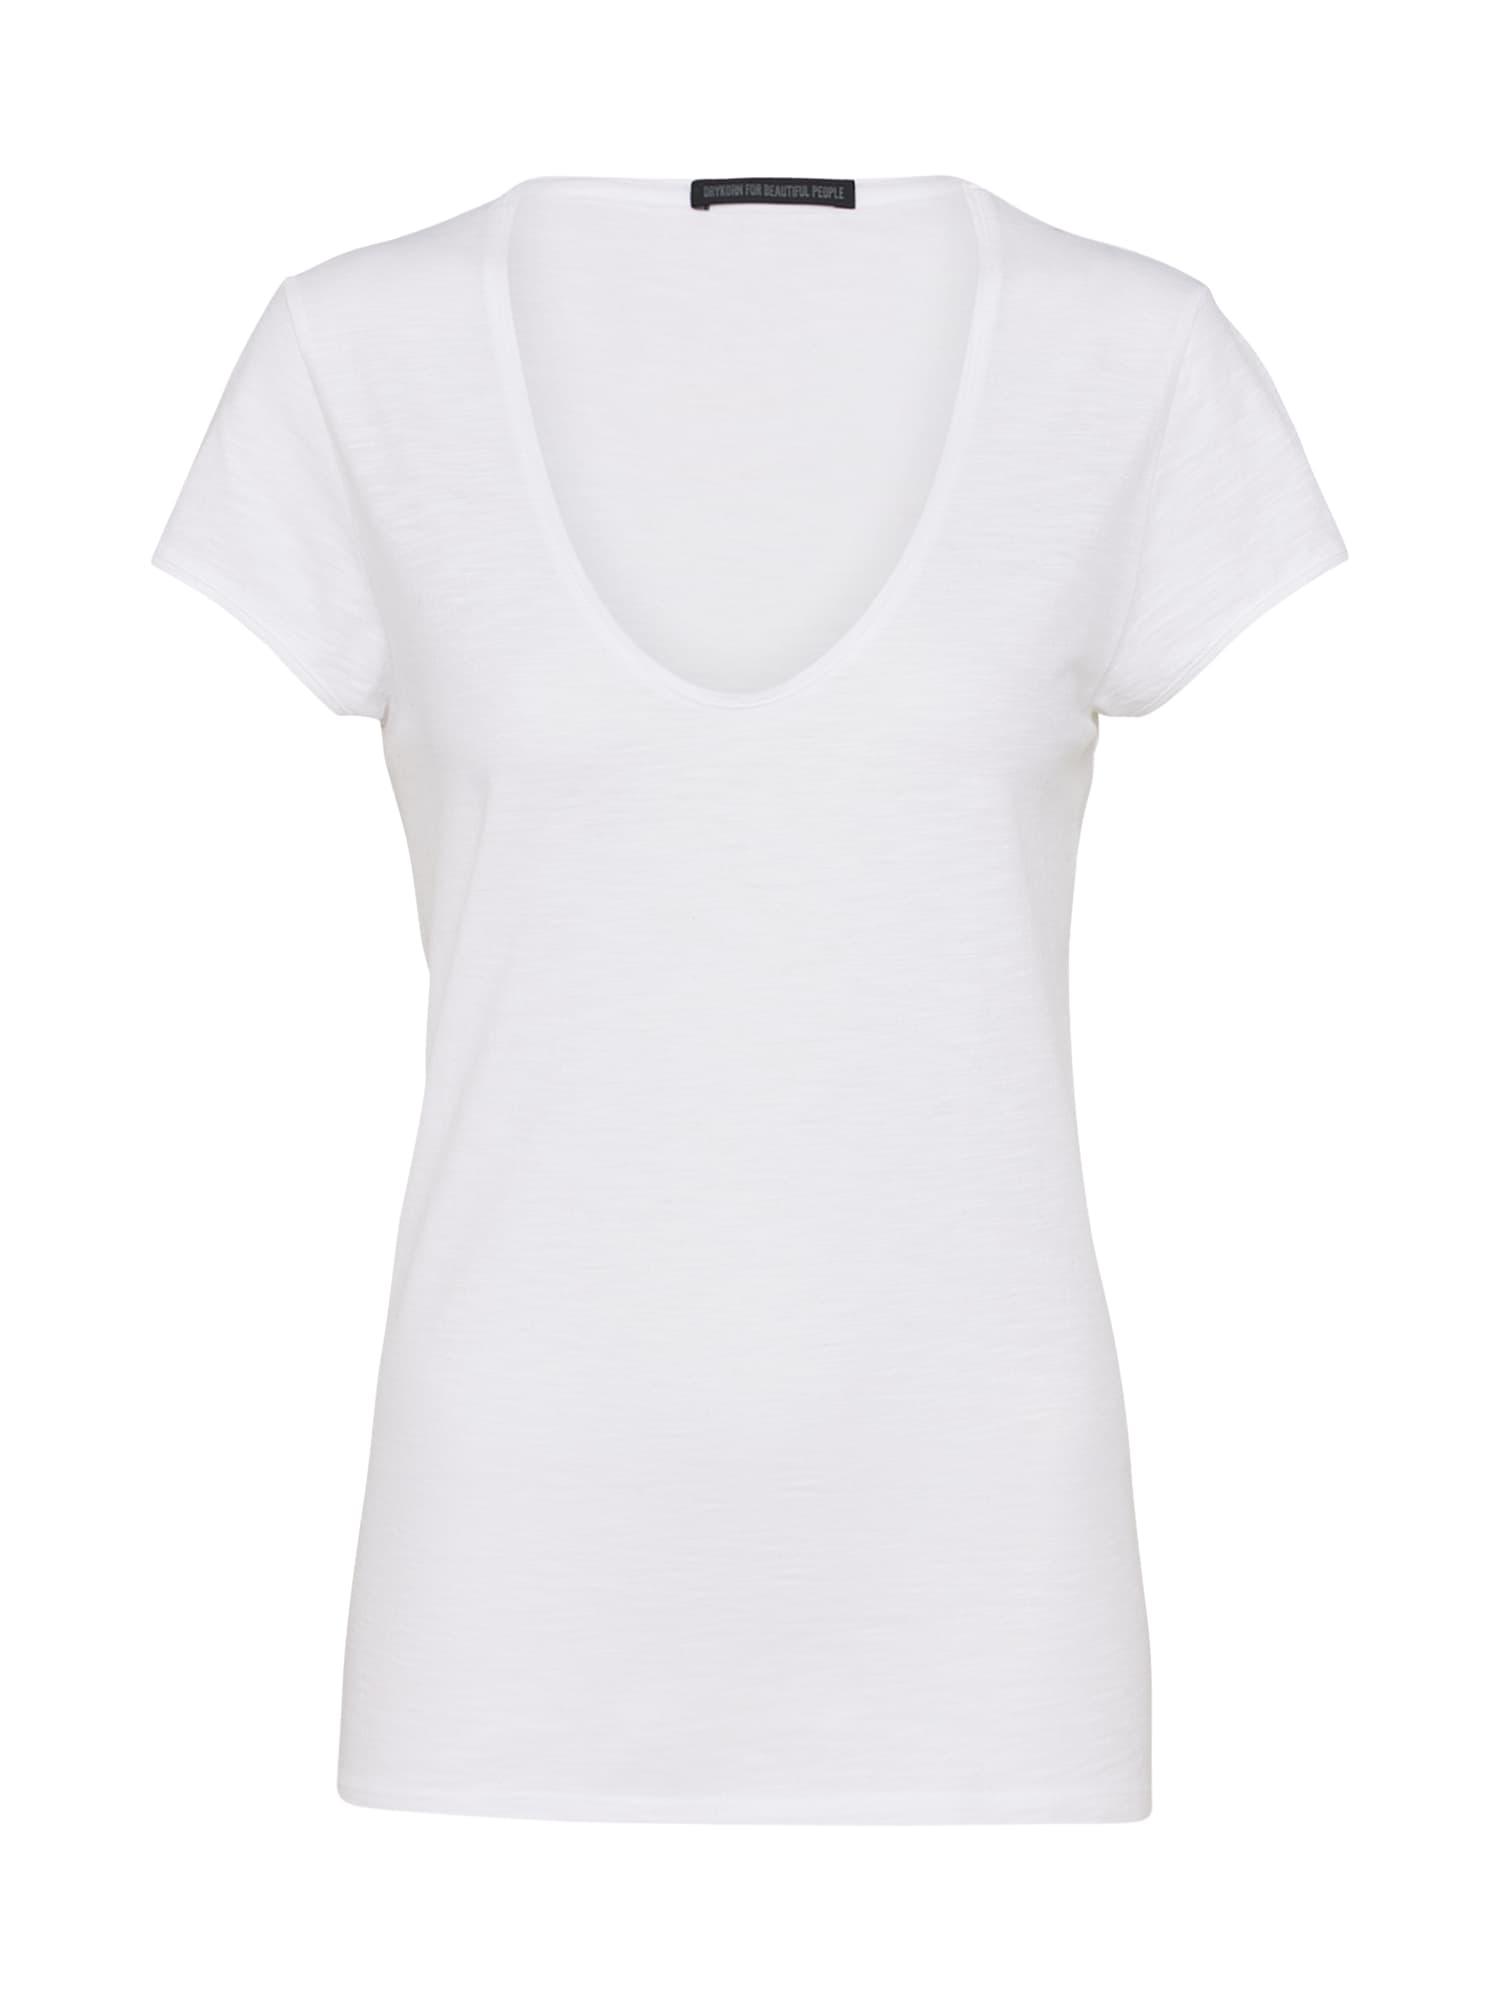 T-Shirt 'AVIVI' | Bekleidung > Shirts > T-Shirts | drykorn